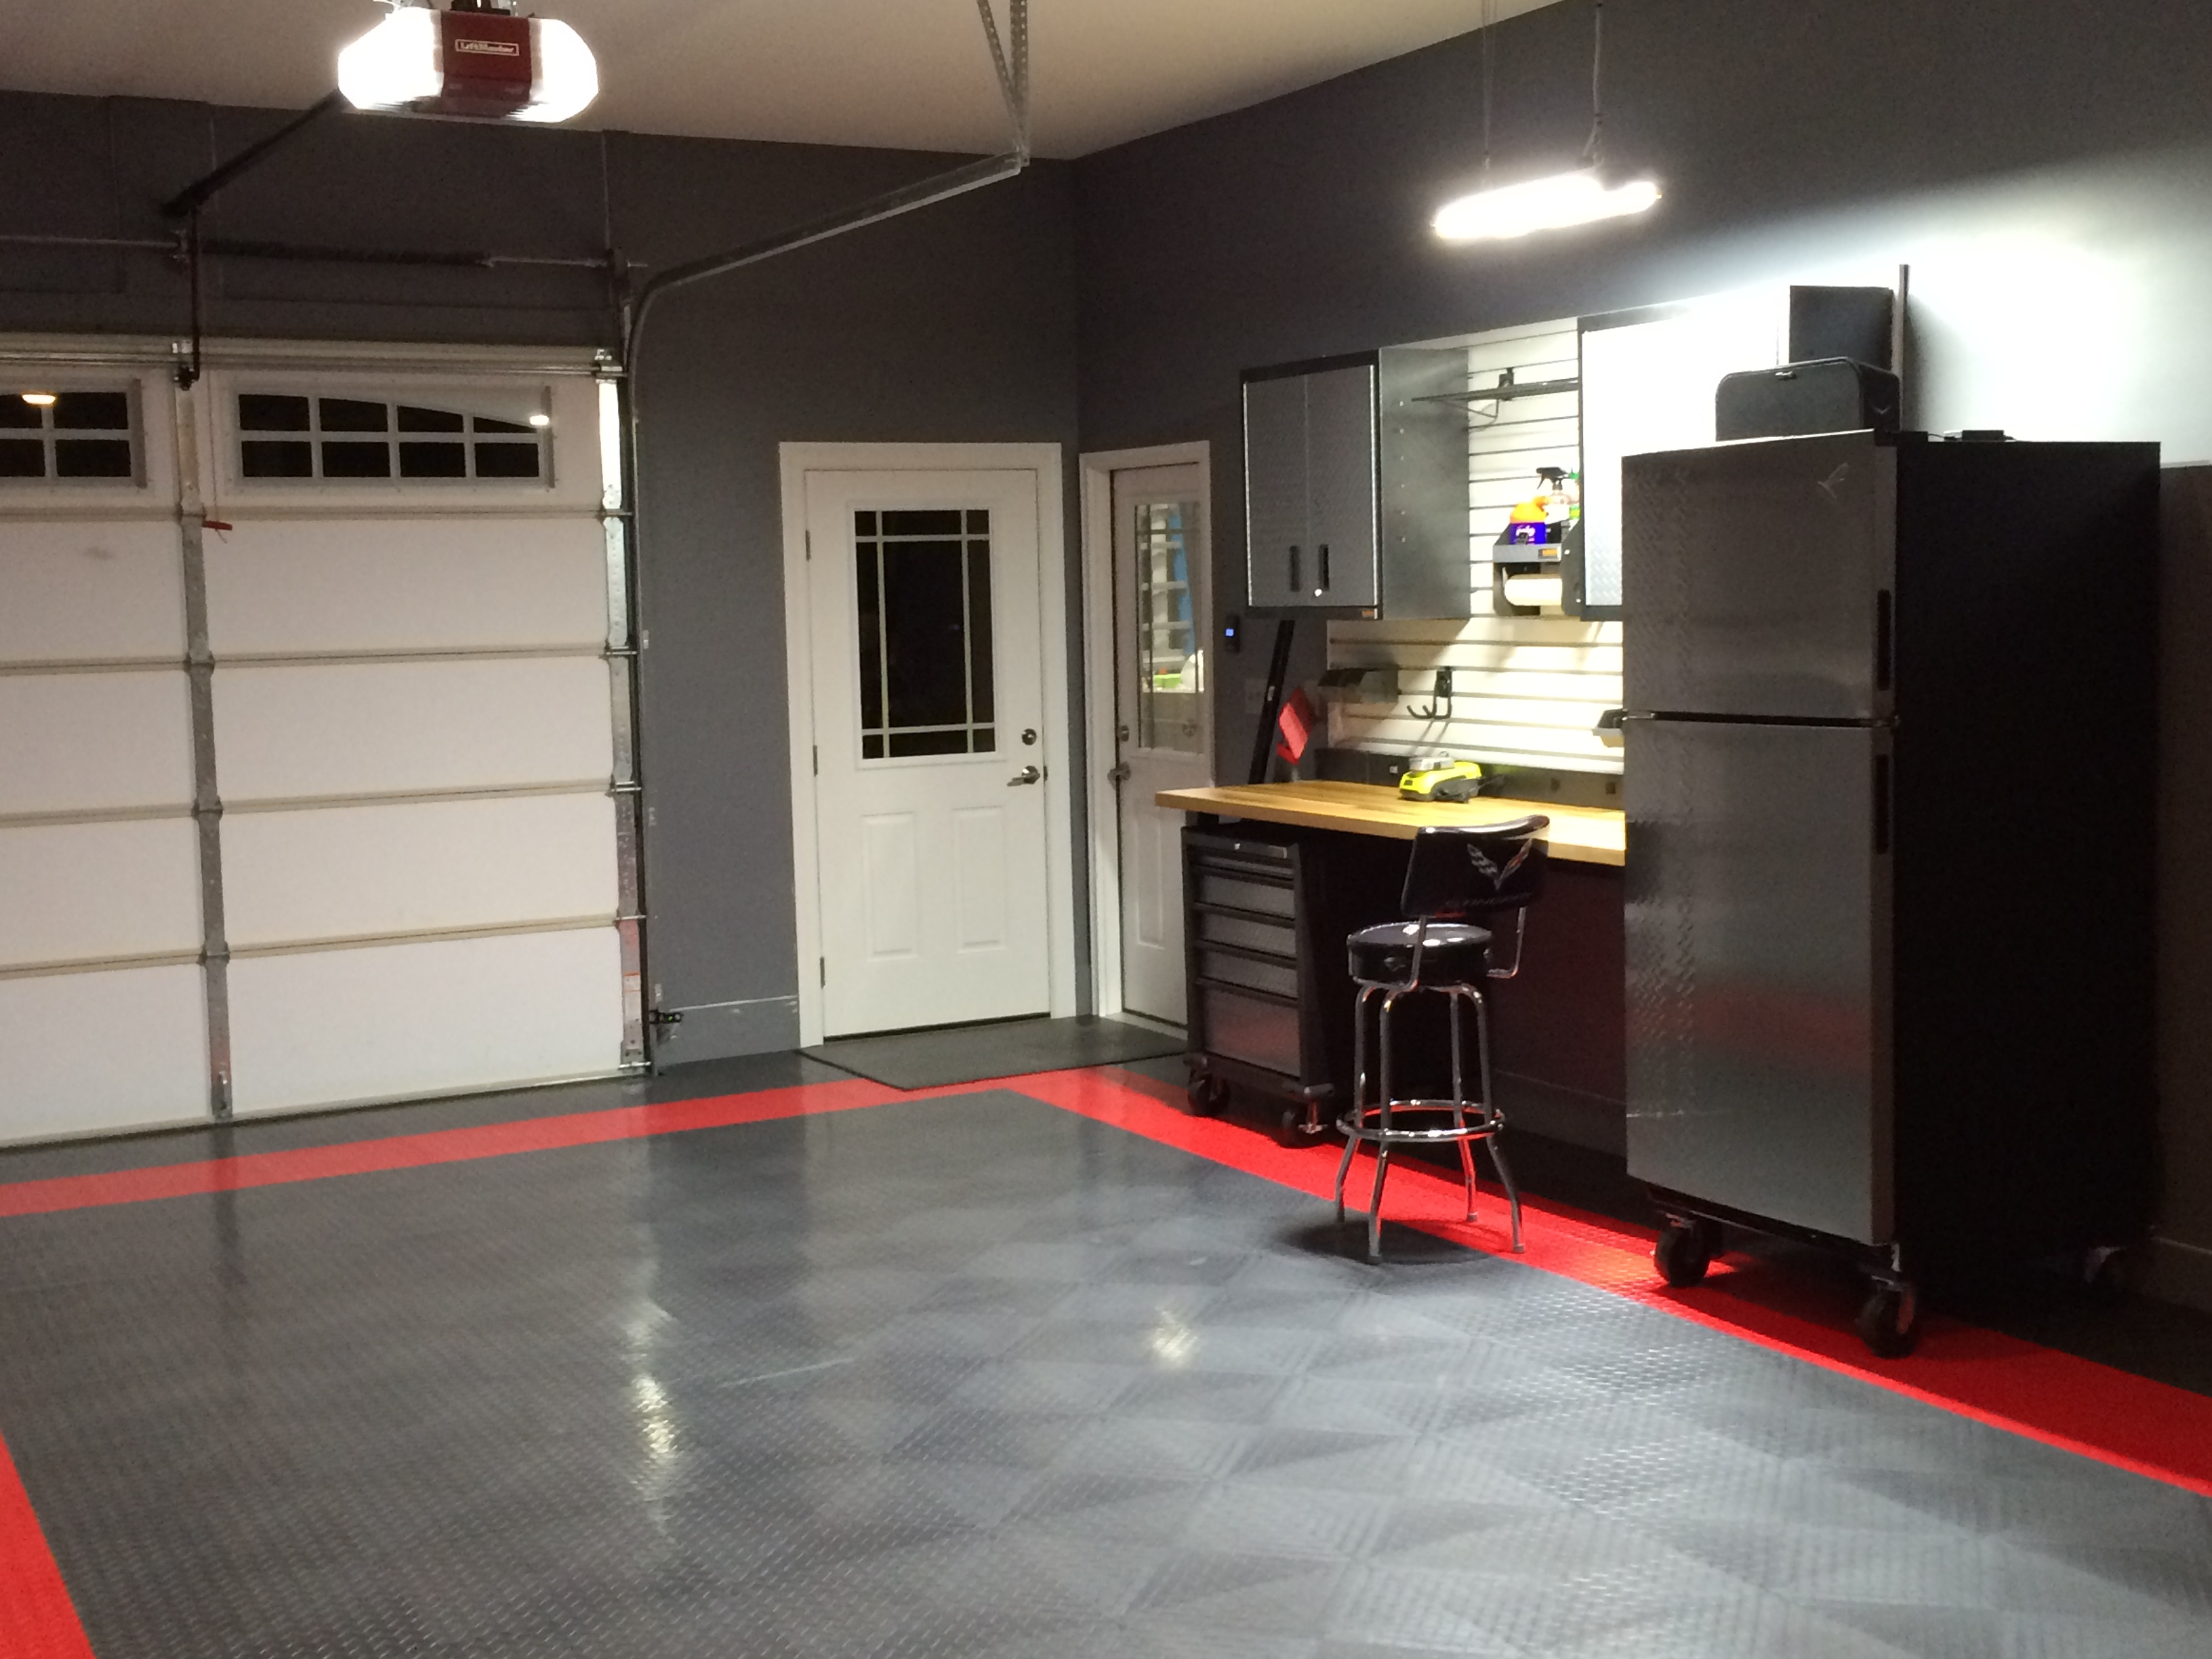 Installing racedeck garage flooring page 5 name imageeg views 1246 size 123 mb dailygadgetfo Gallery